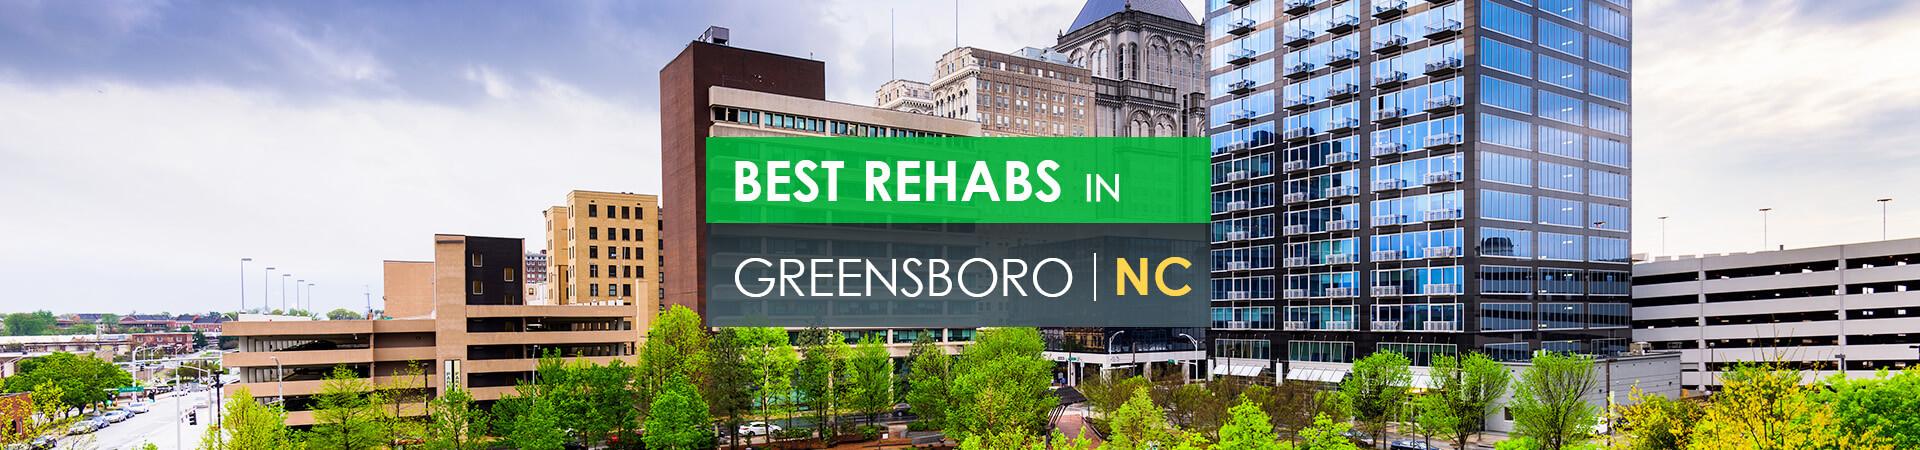 Best rehabs in Greensboro, NC